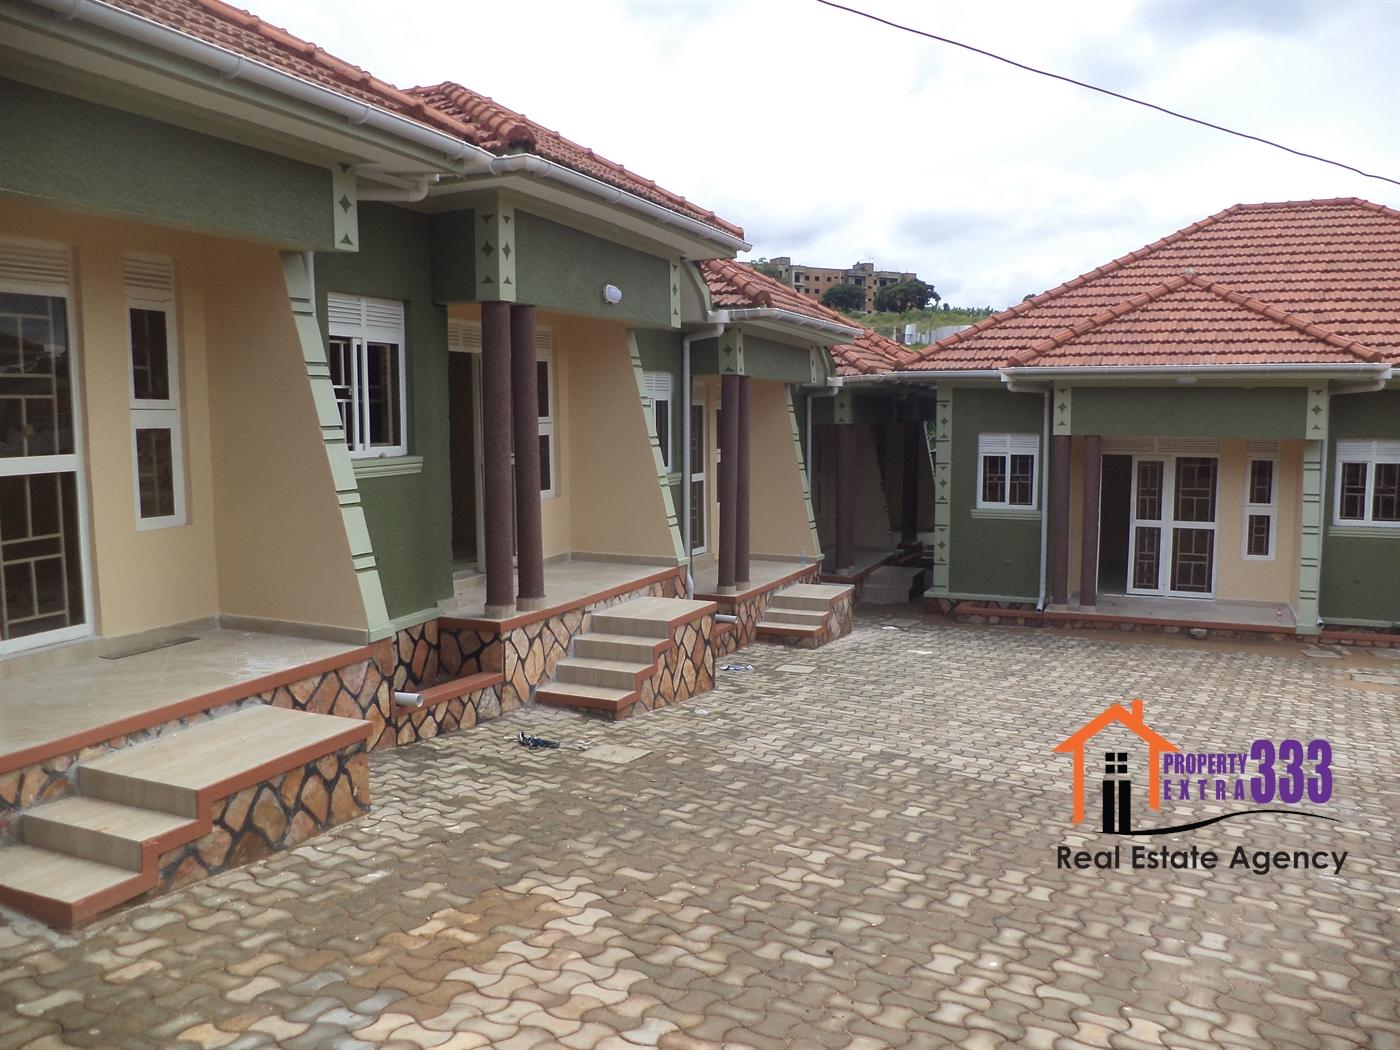 Rental units for sale in Kyanja Kampala